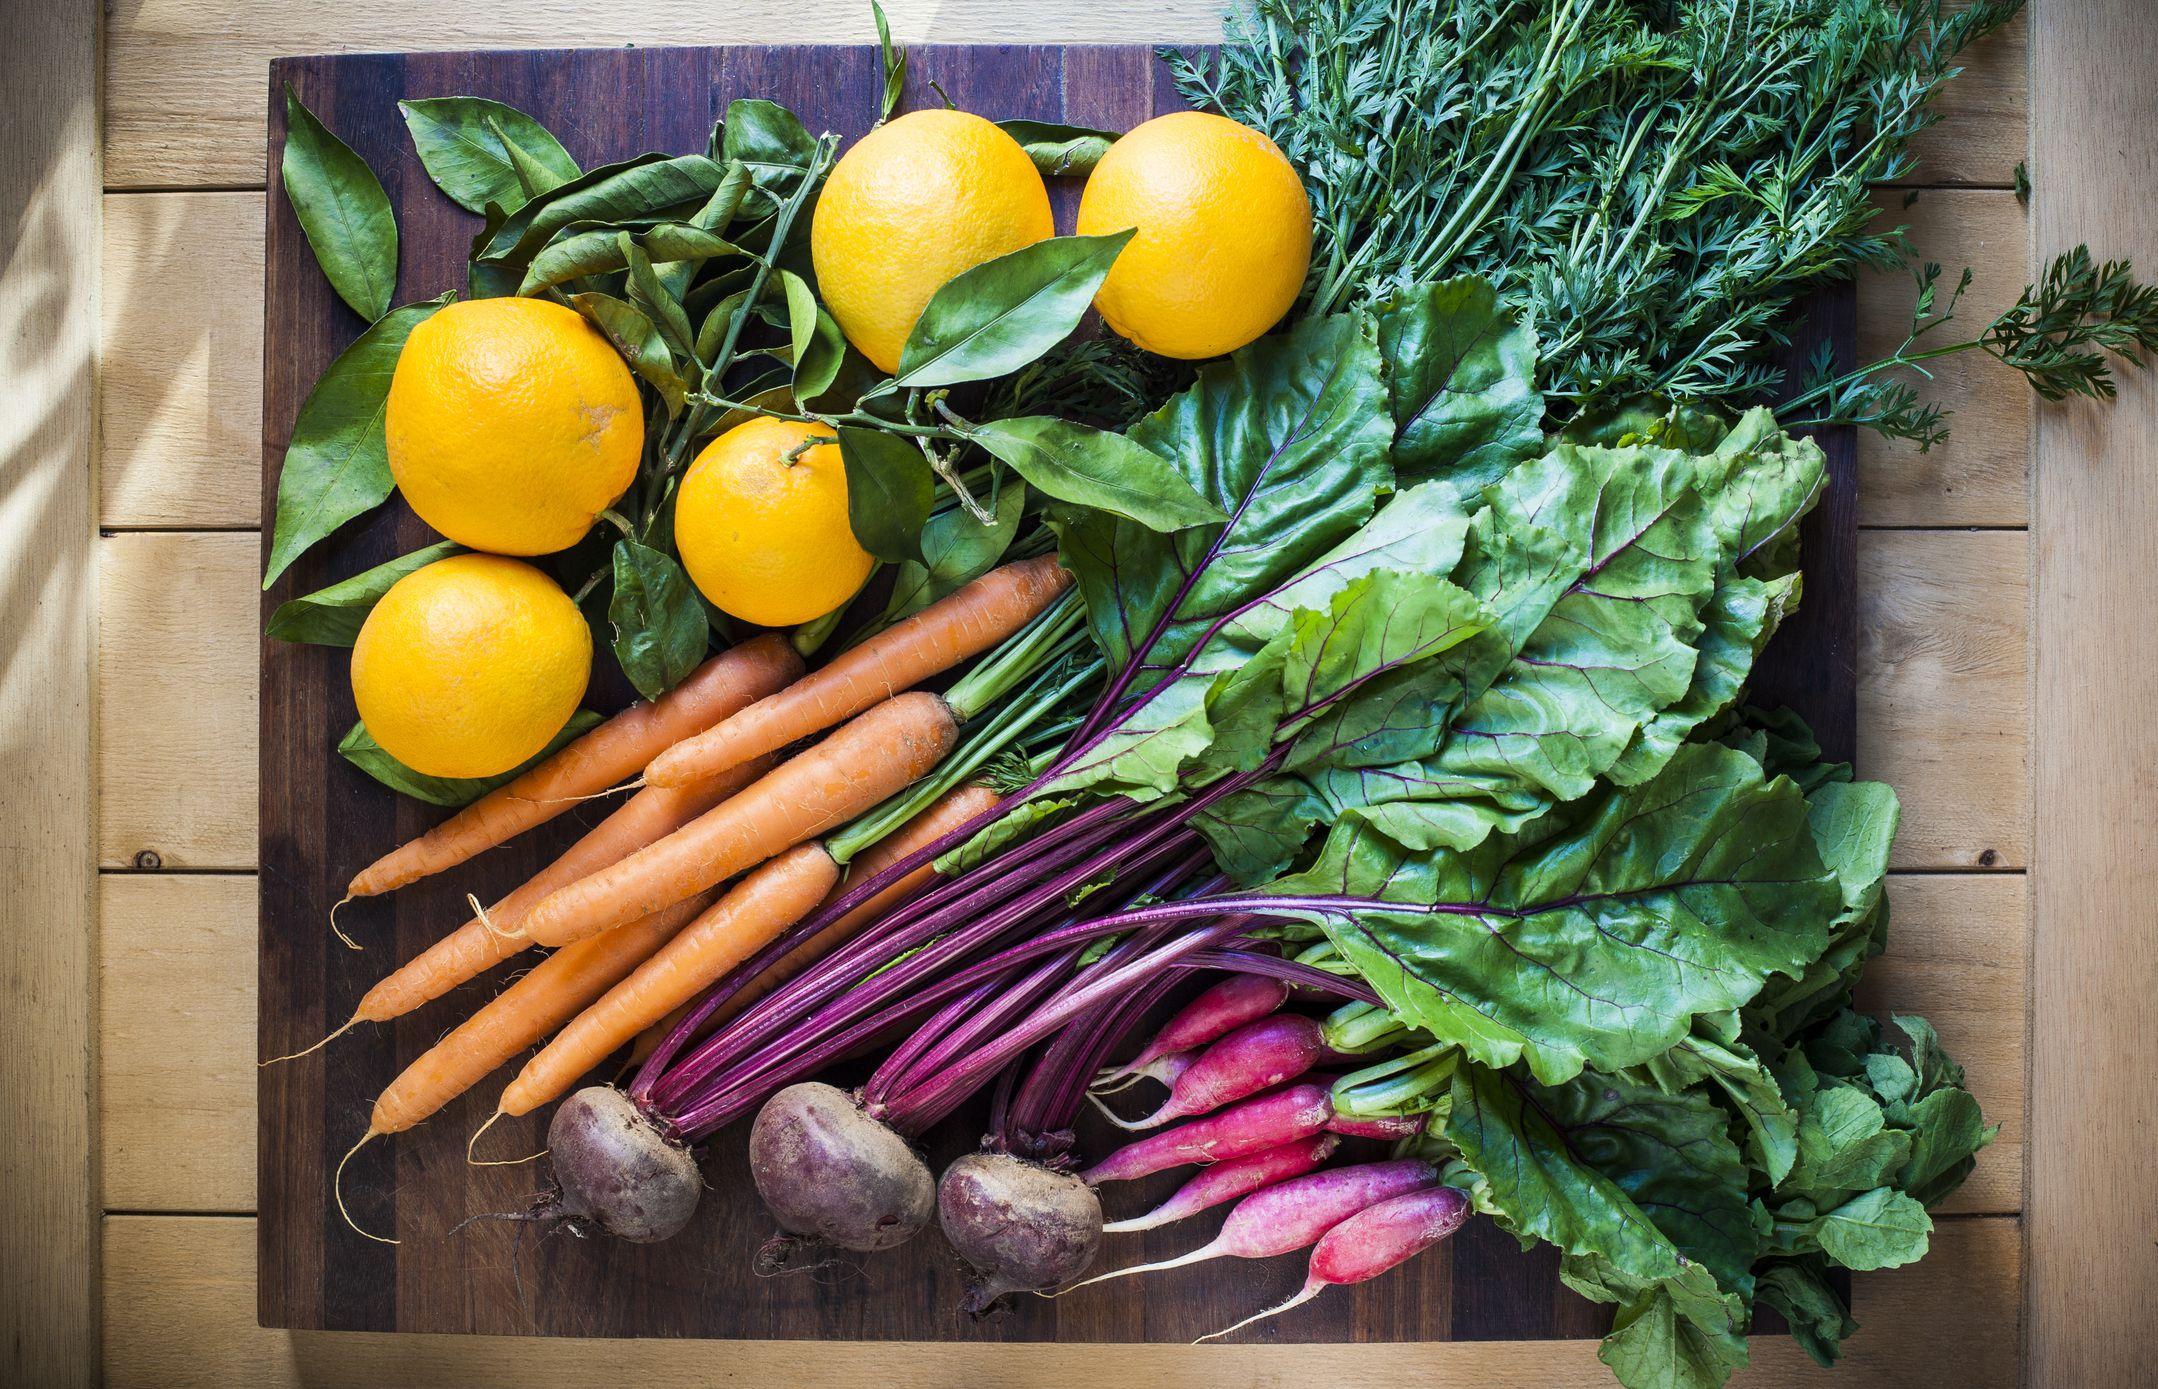 Florida Seasonal Fruits and Vegetables Guide